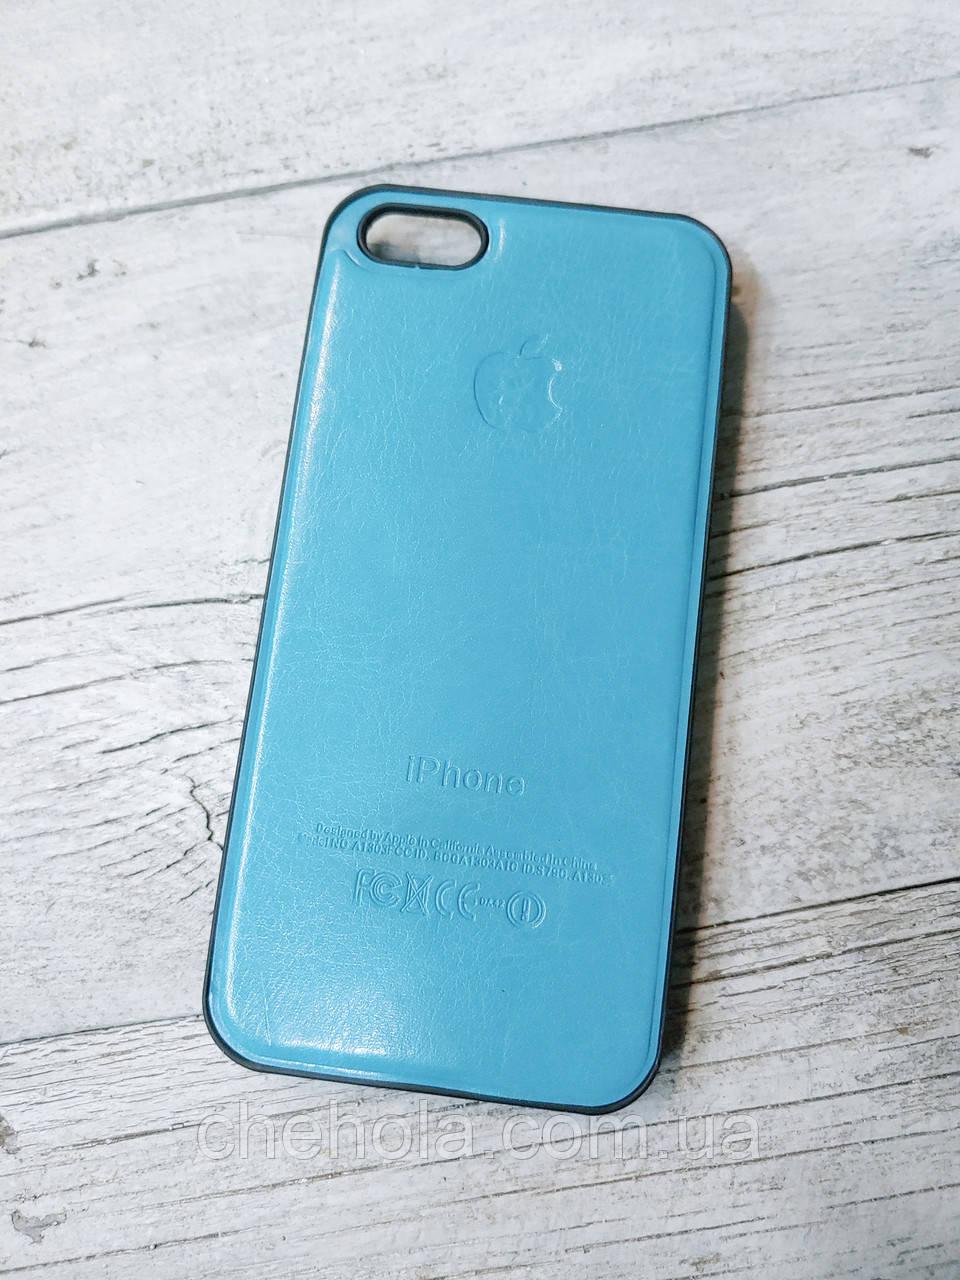 Протиударний шкіряний чохол для Iphone 5 5S SE Senator Блакитний